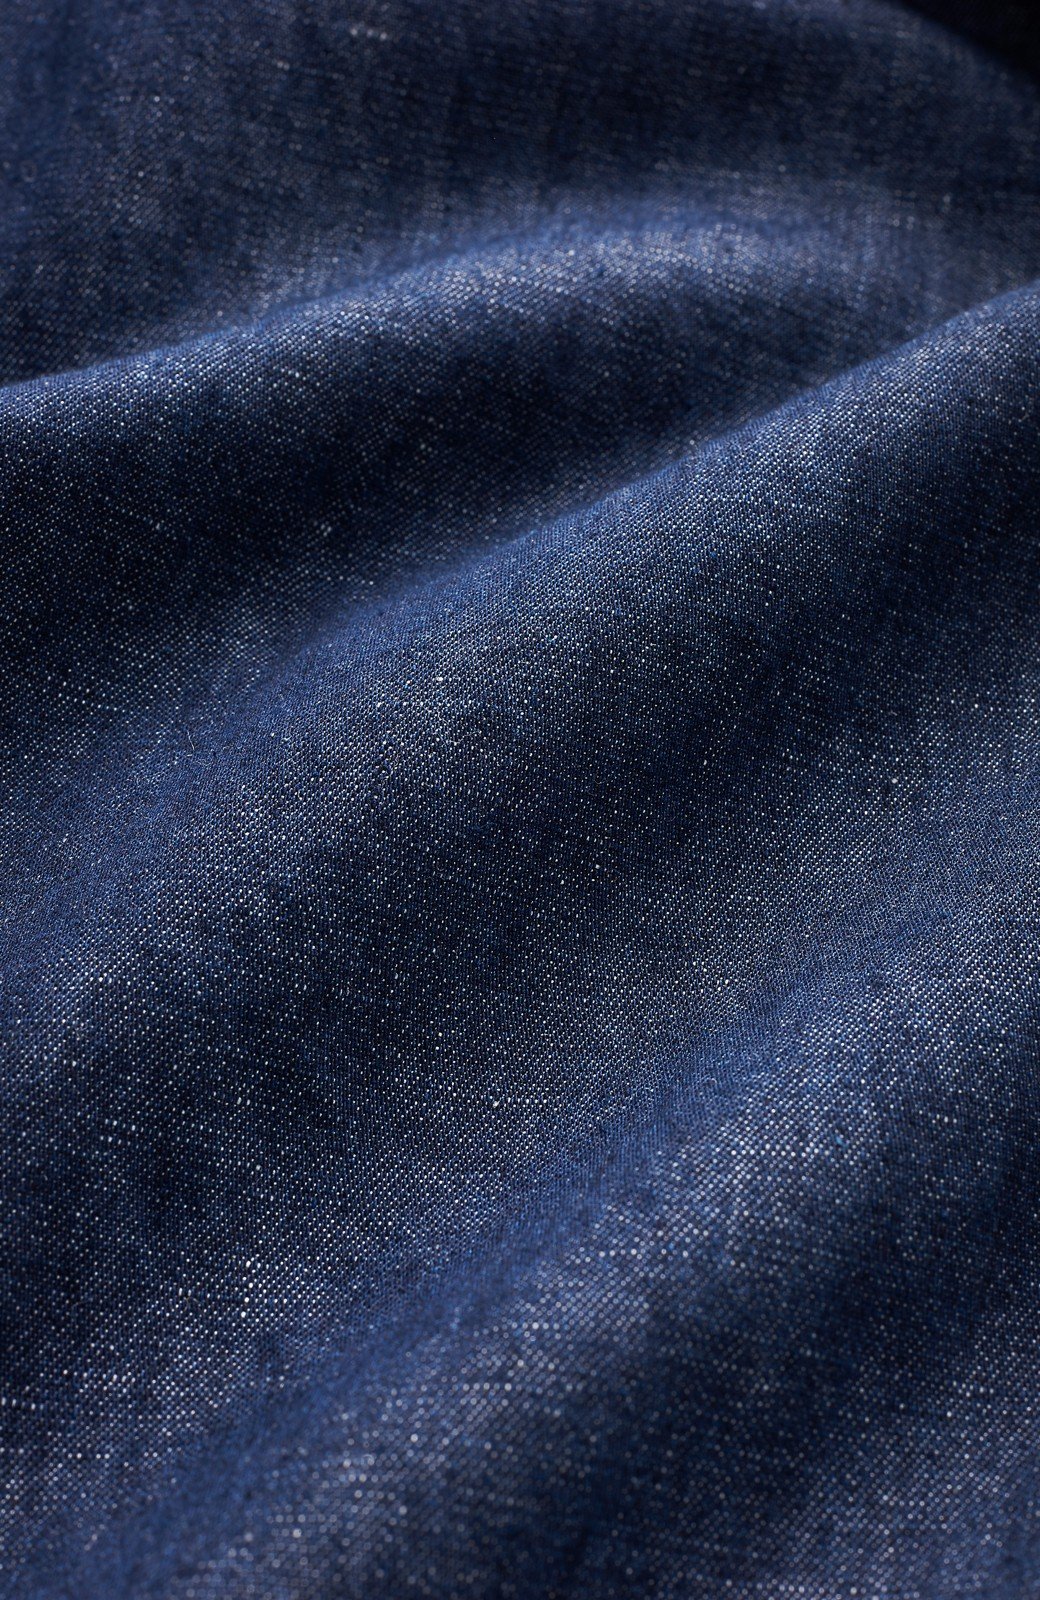 nusy 綿麻デニムのウエストリボンワイドパンツ <インディゴブルー>の商品写真2